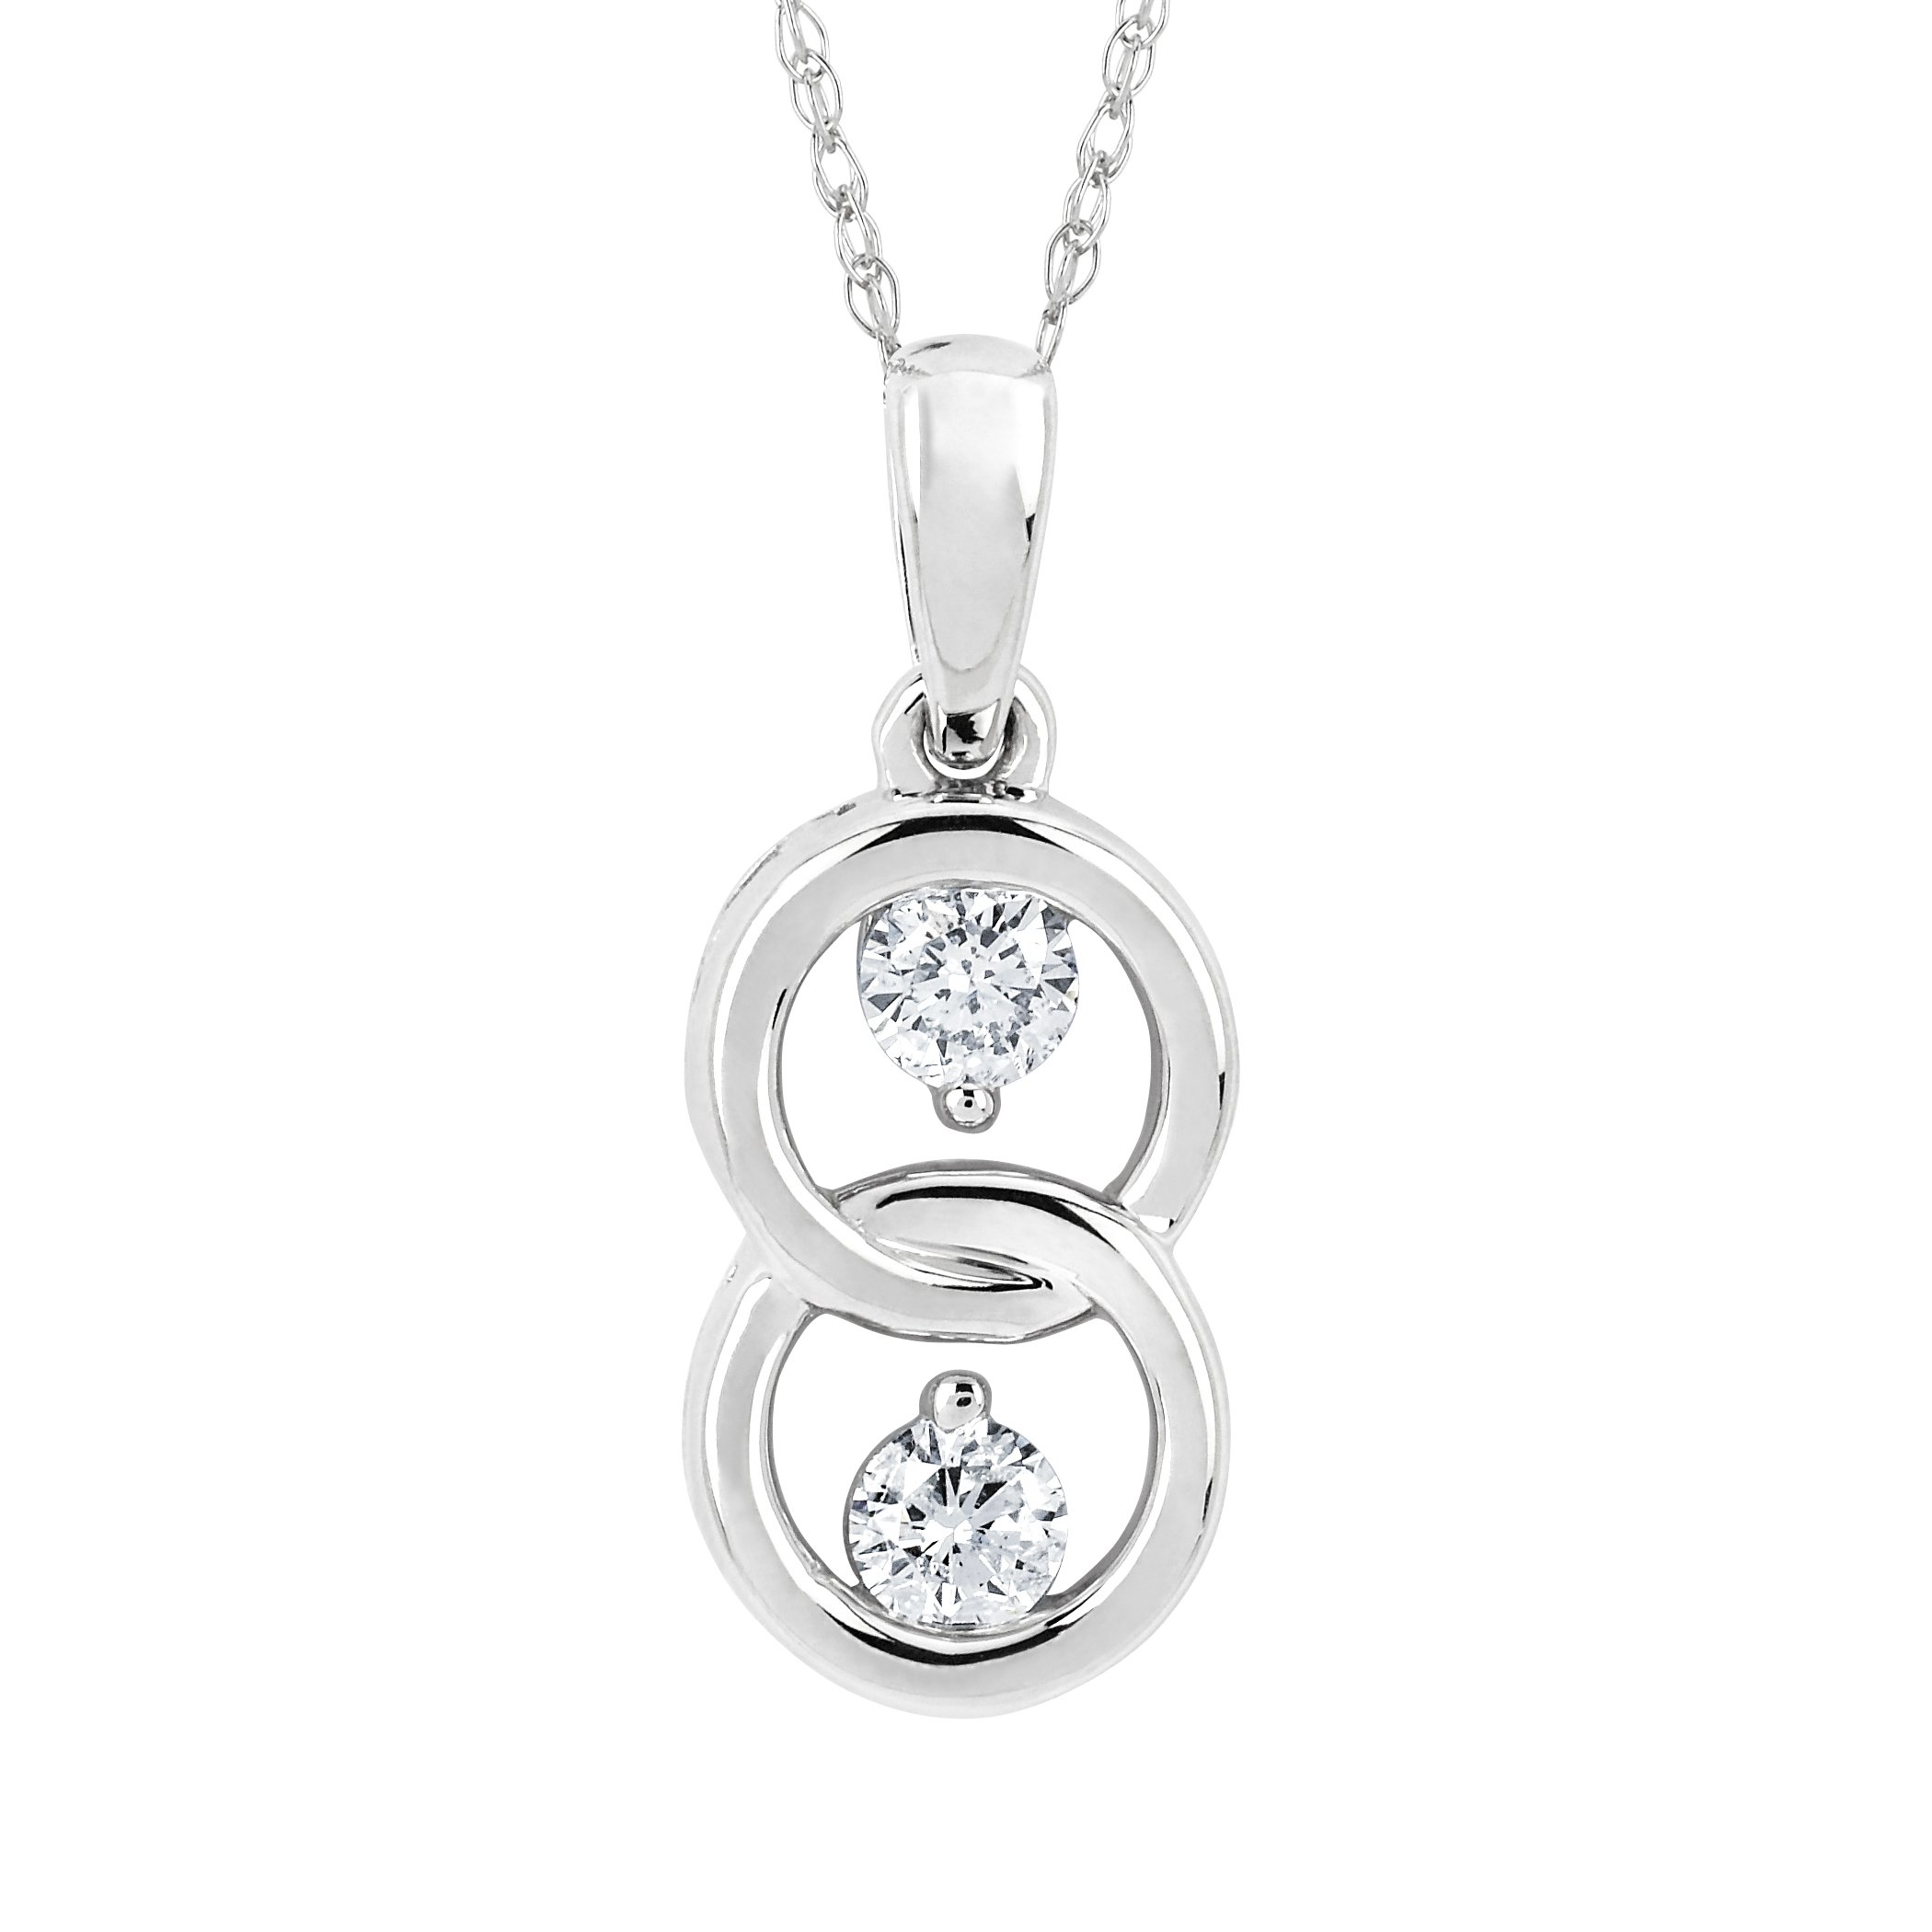 10K White Gold 1/5 Ctw. Diamond Two Stone Interlocking Love Pendant Necklace with Chain